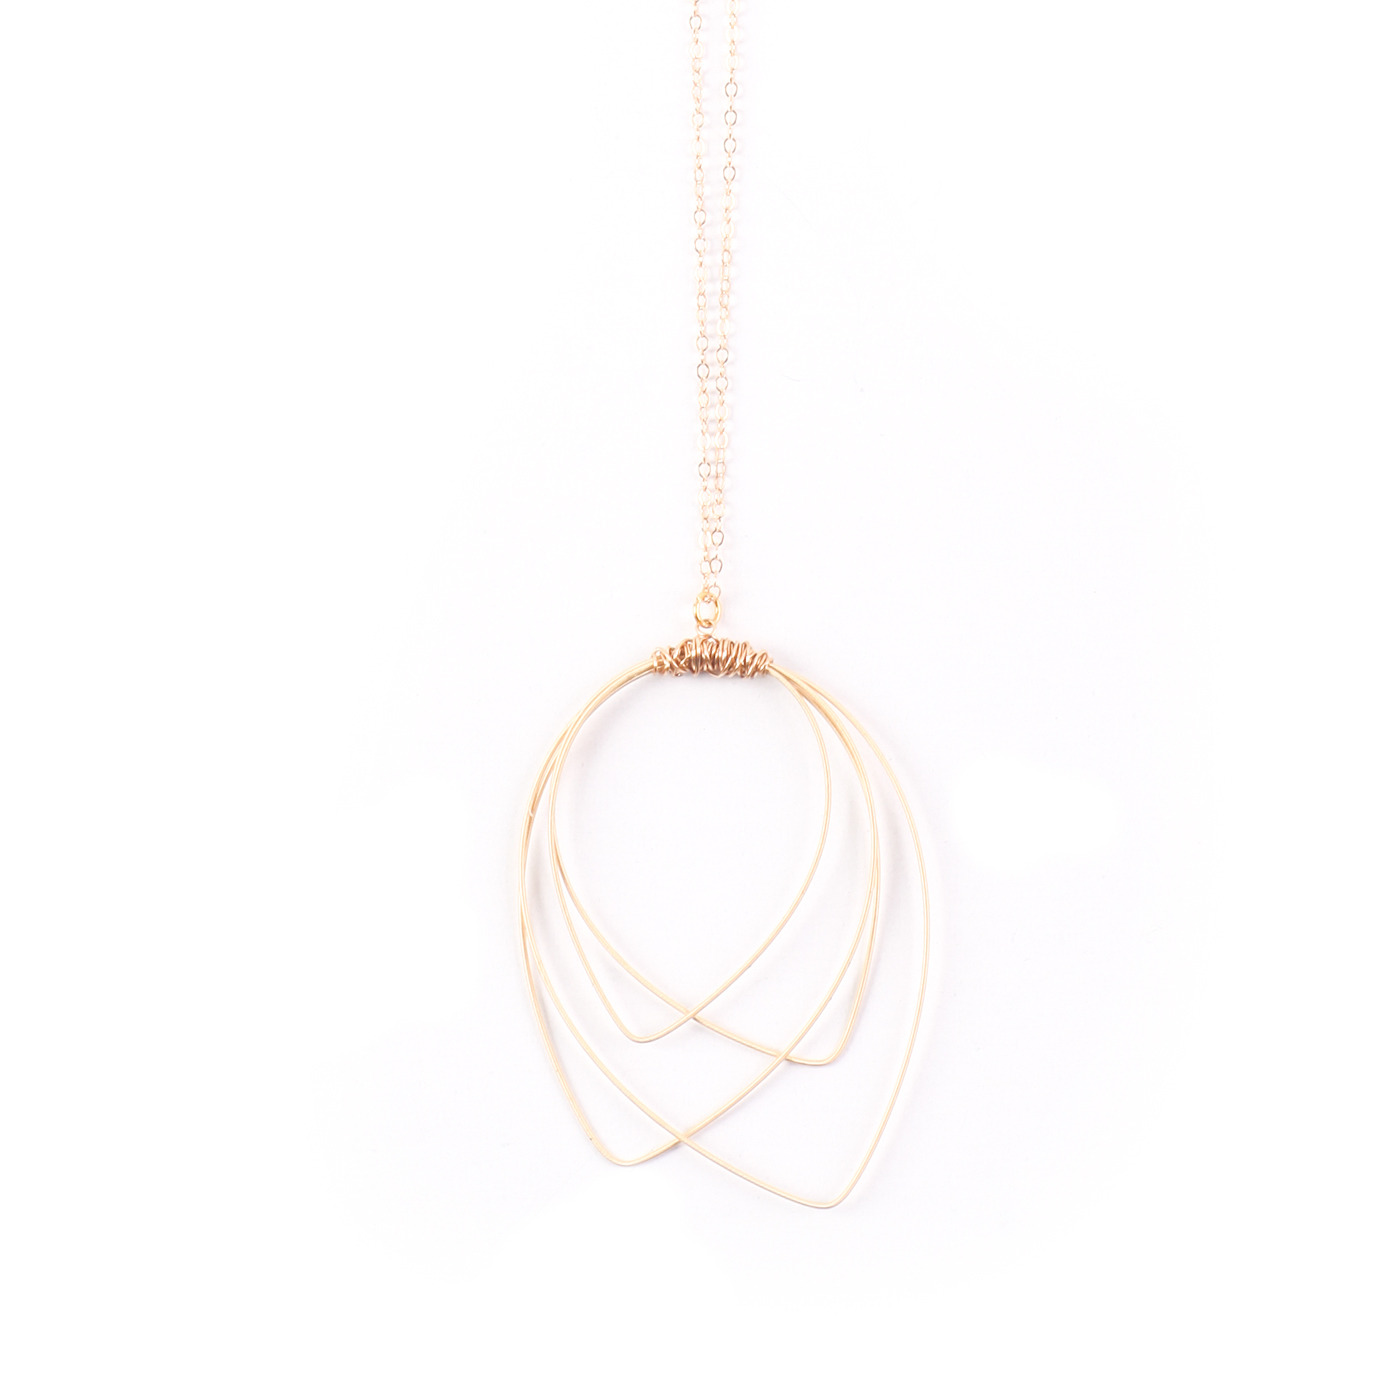 Artisan, Eco-Friendly, Designer Back Stage Necklace